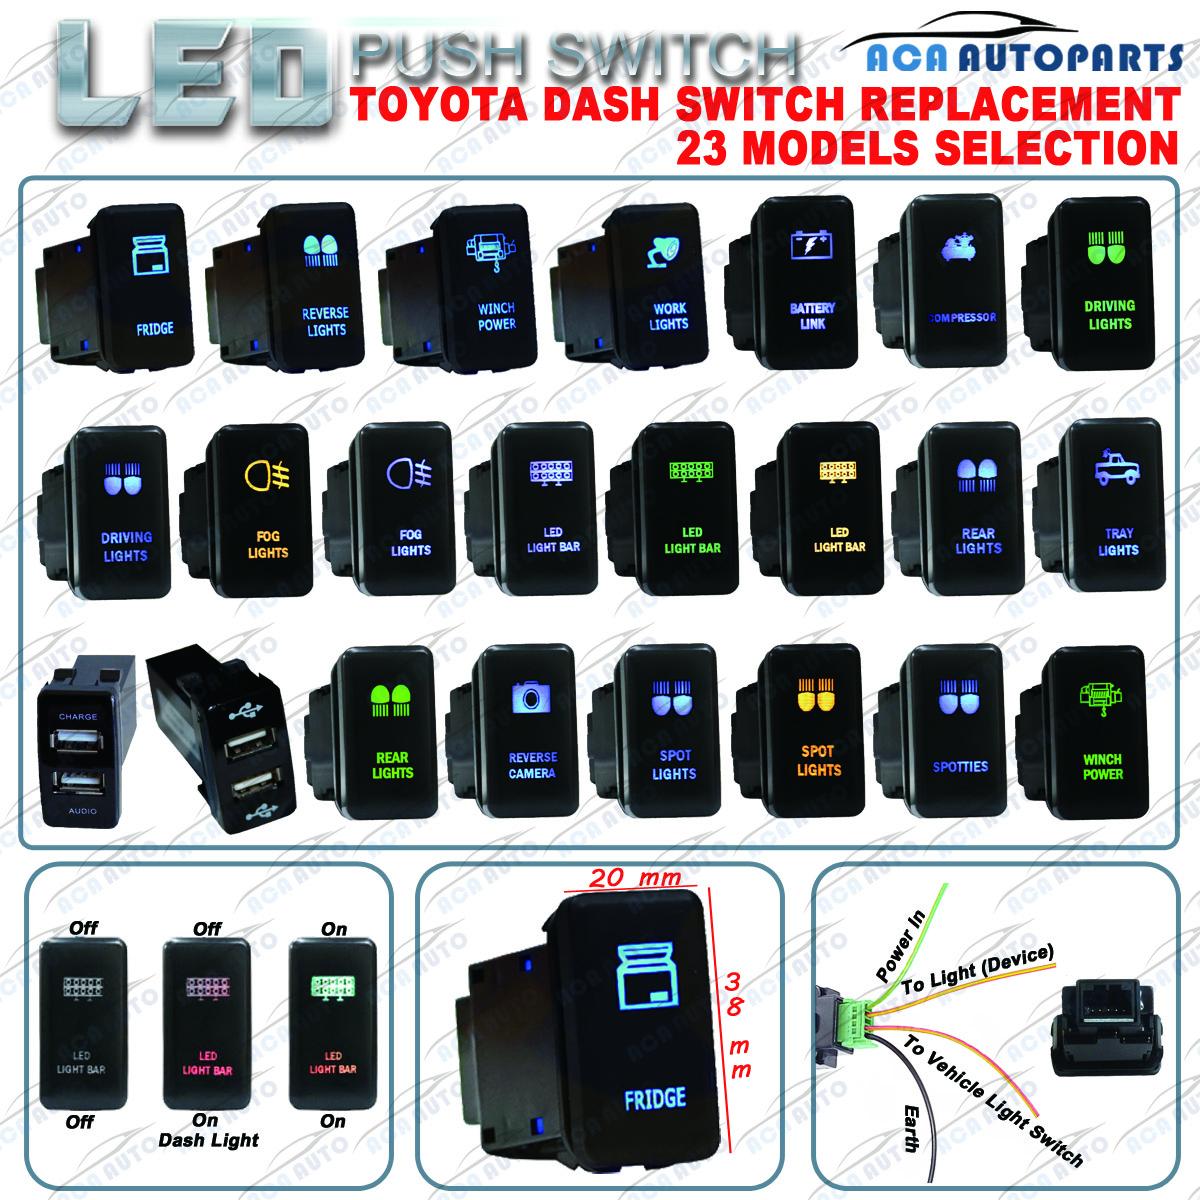 12v 3a Led Push Rocker Switch Toyota Fj Cruise Land